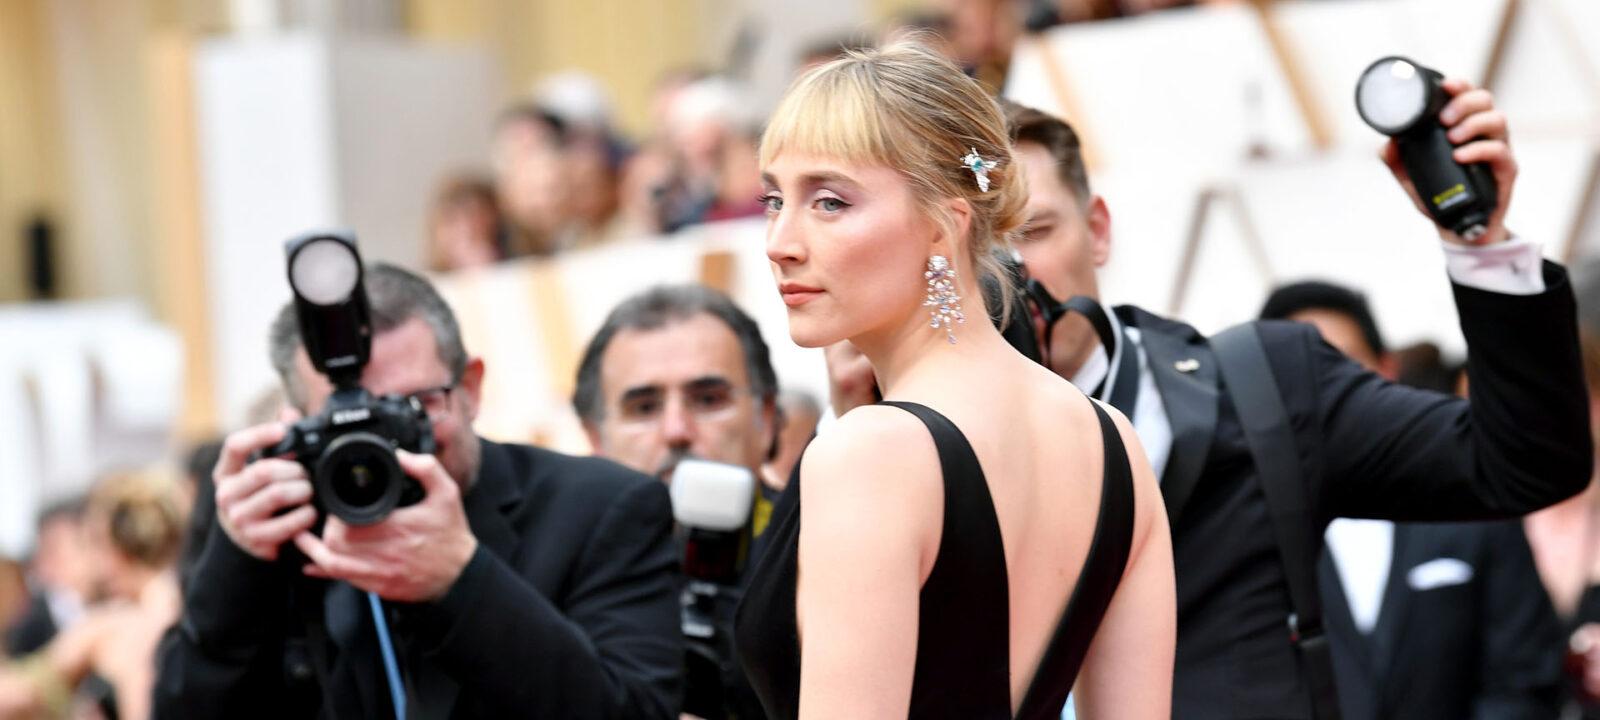 92nd Annual Academy Awards – Arrivals